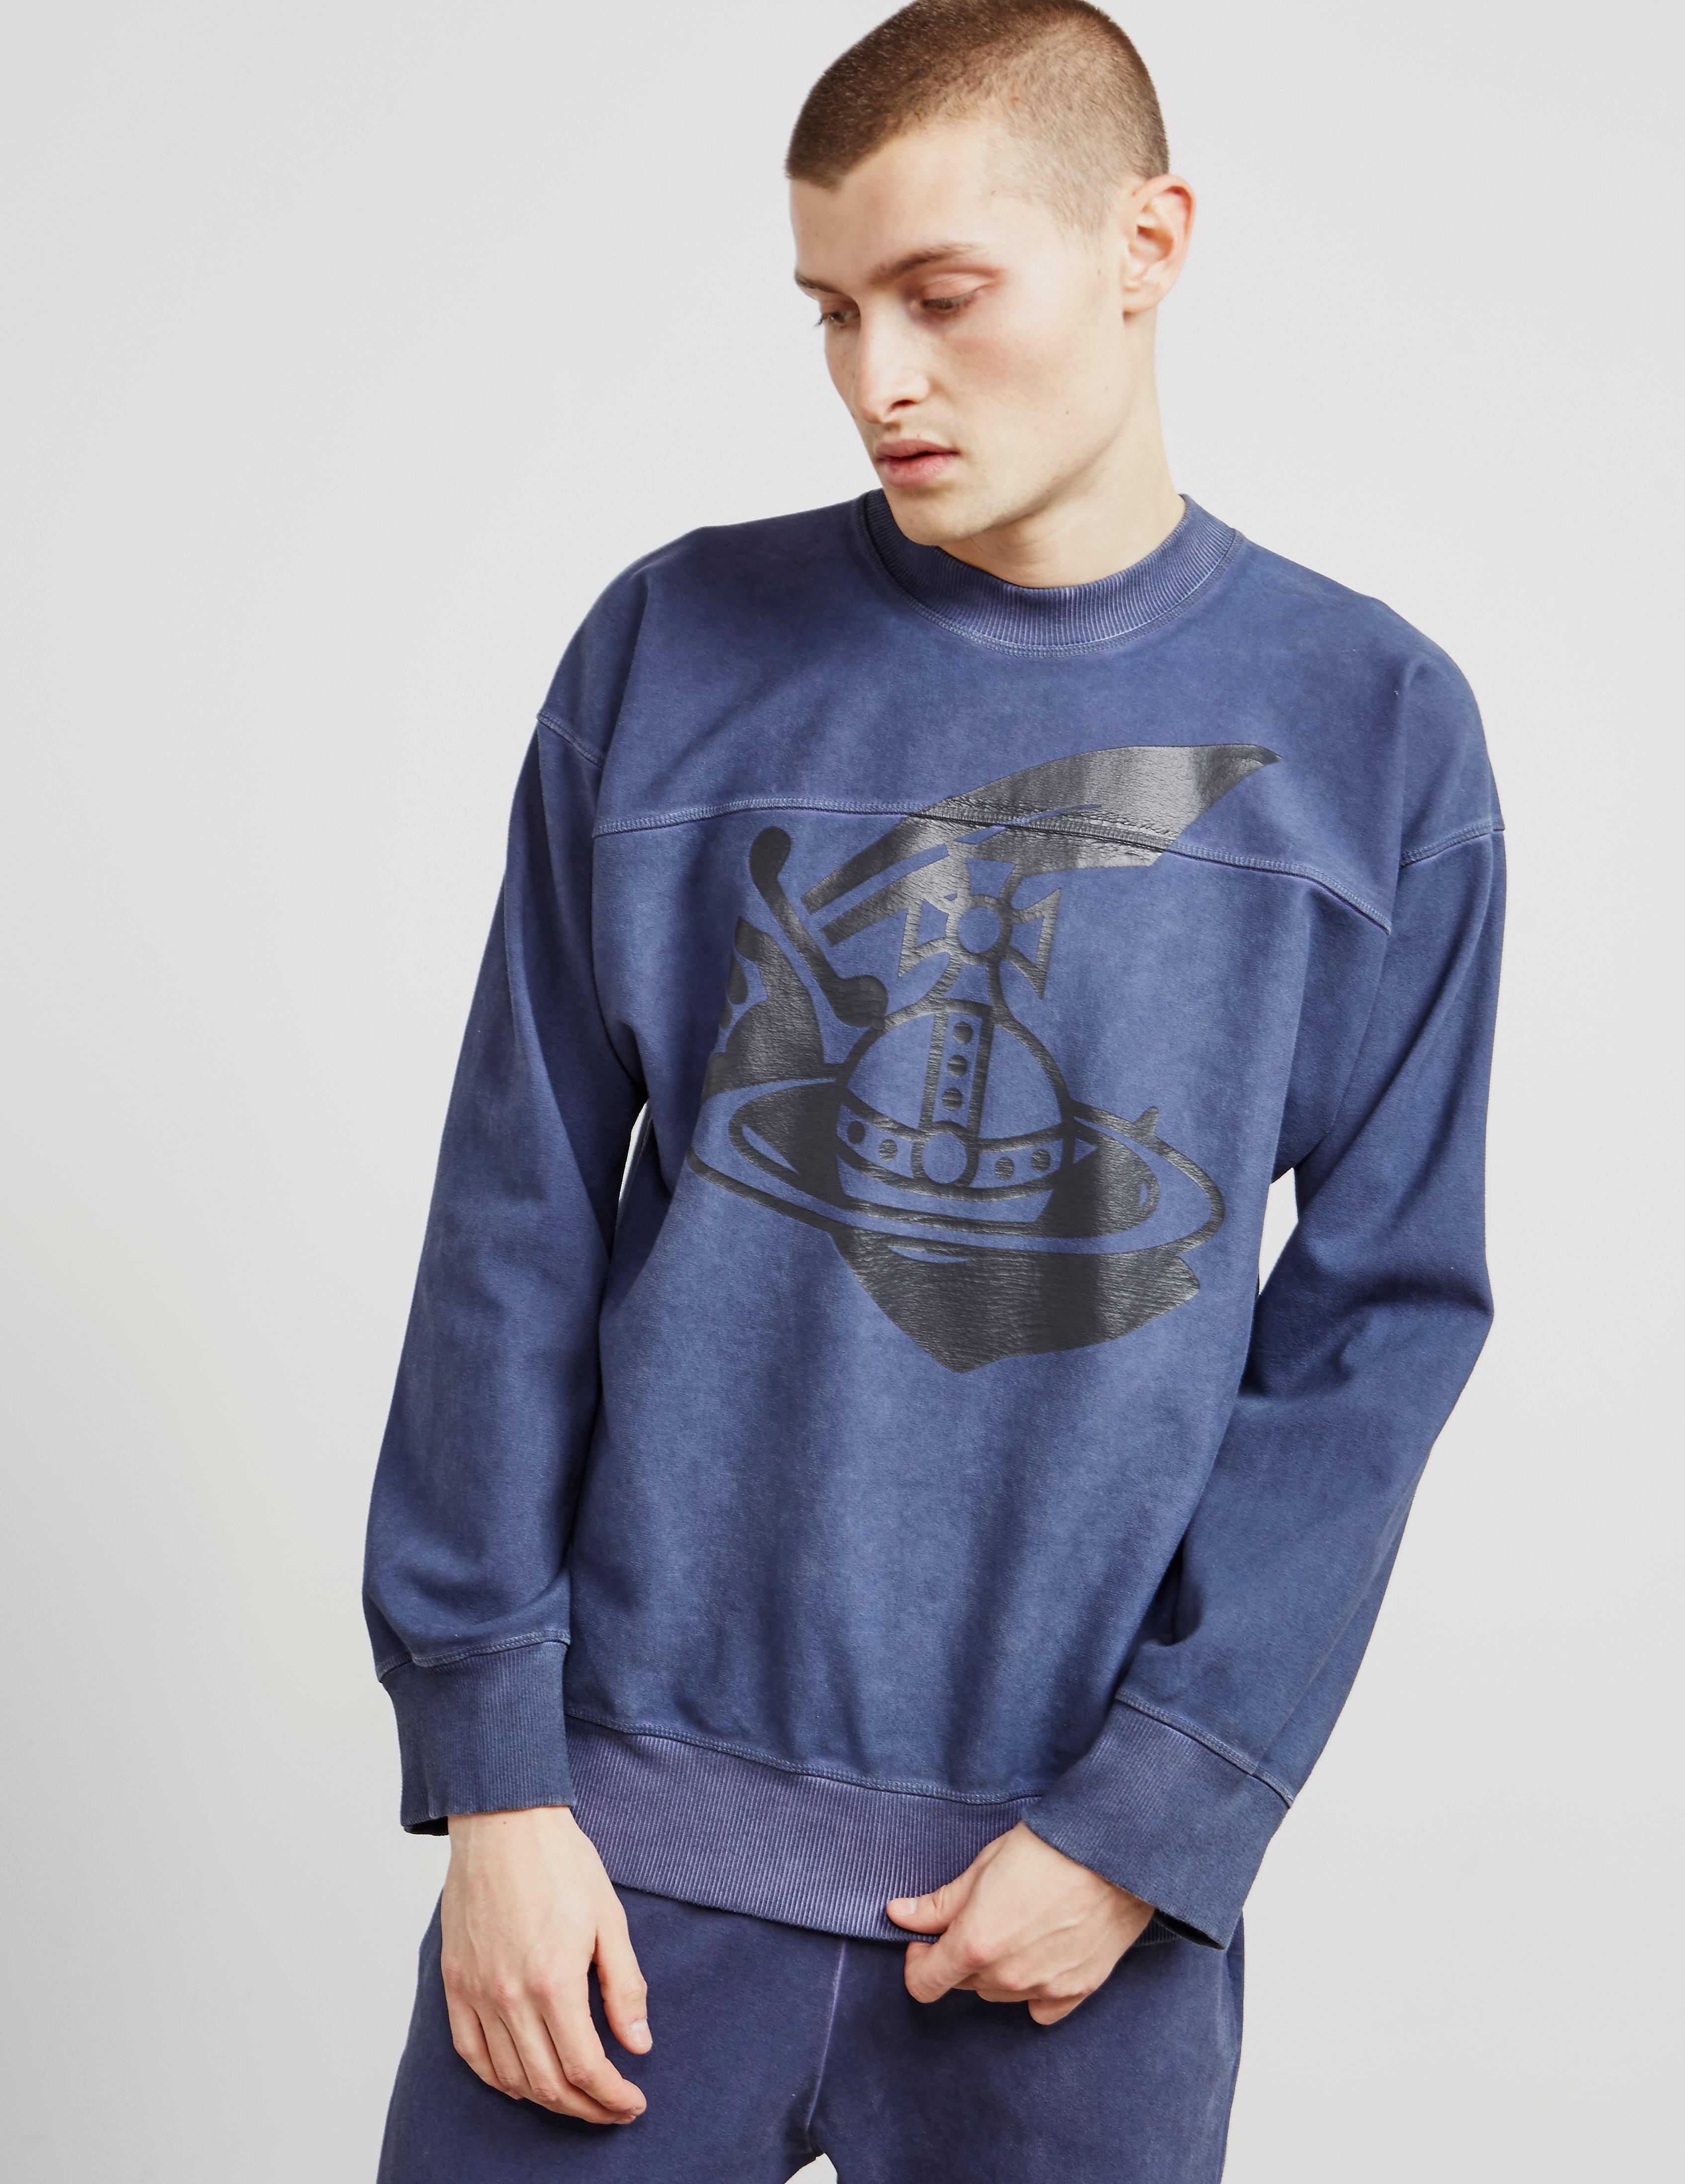 Vivienne Westwood Anglomania Sword Sweatshirt